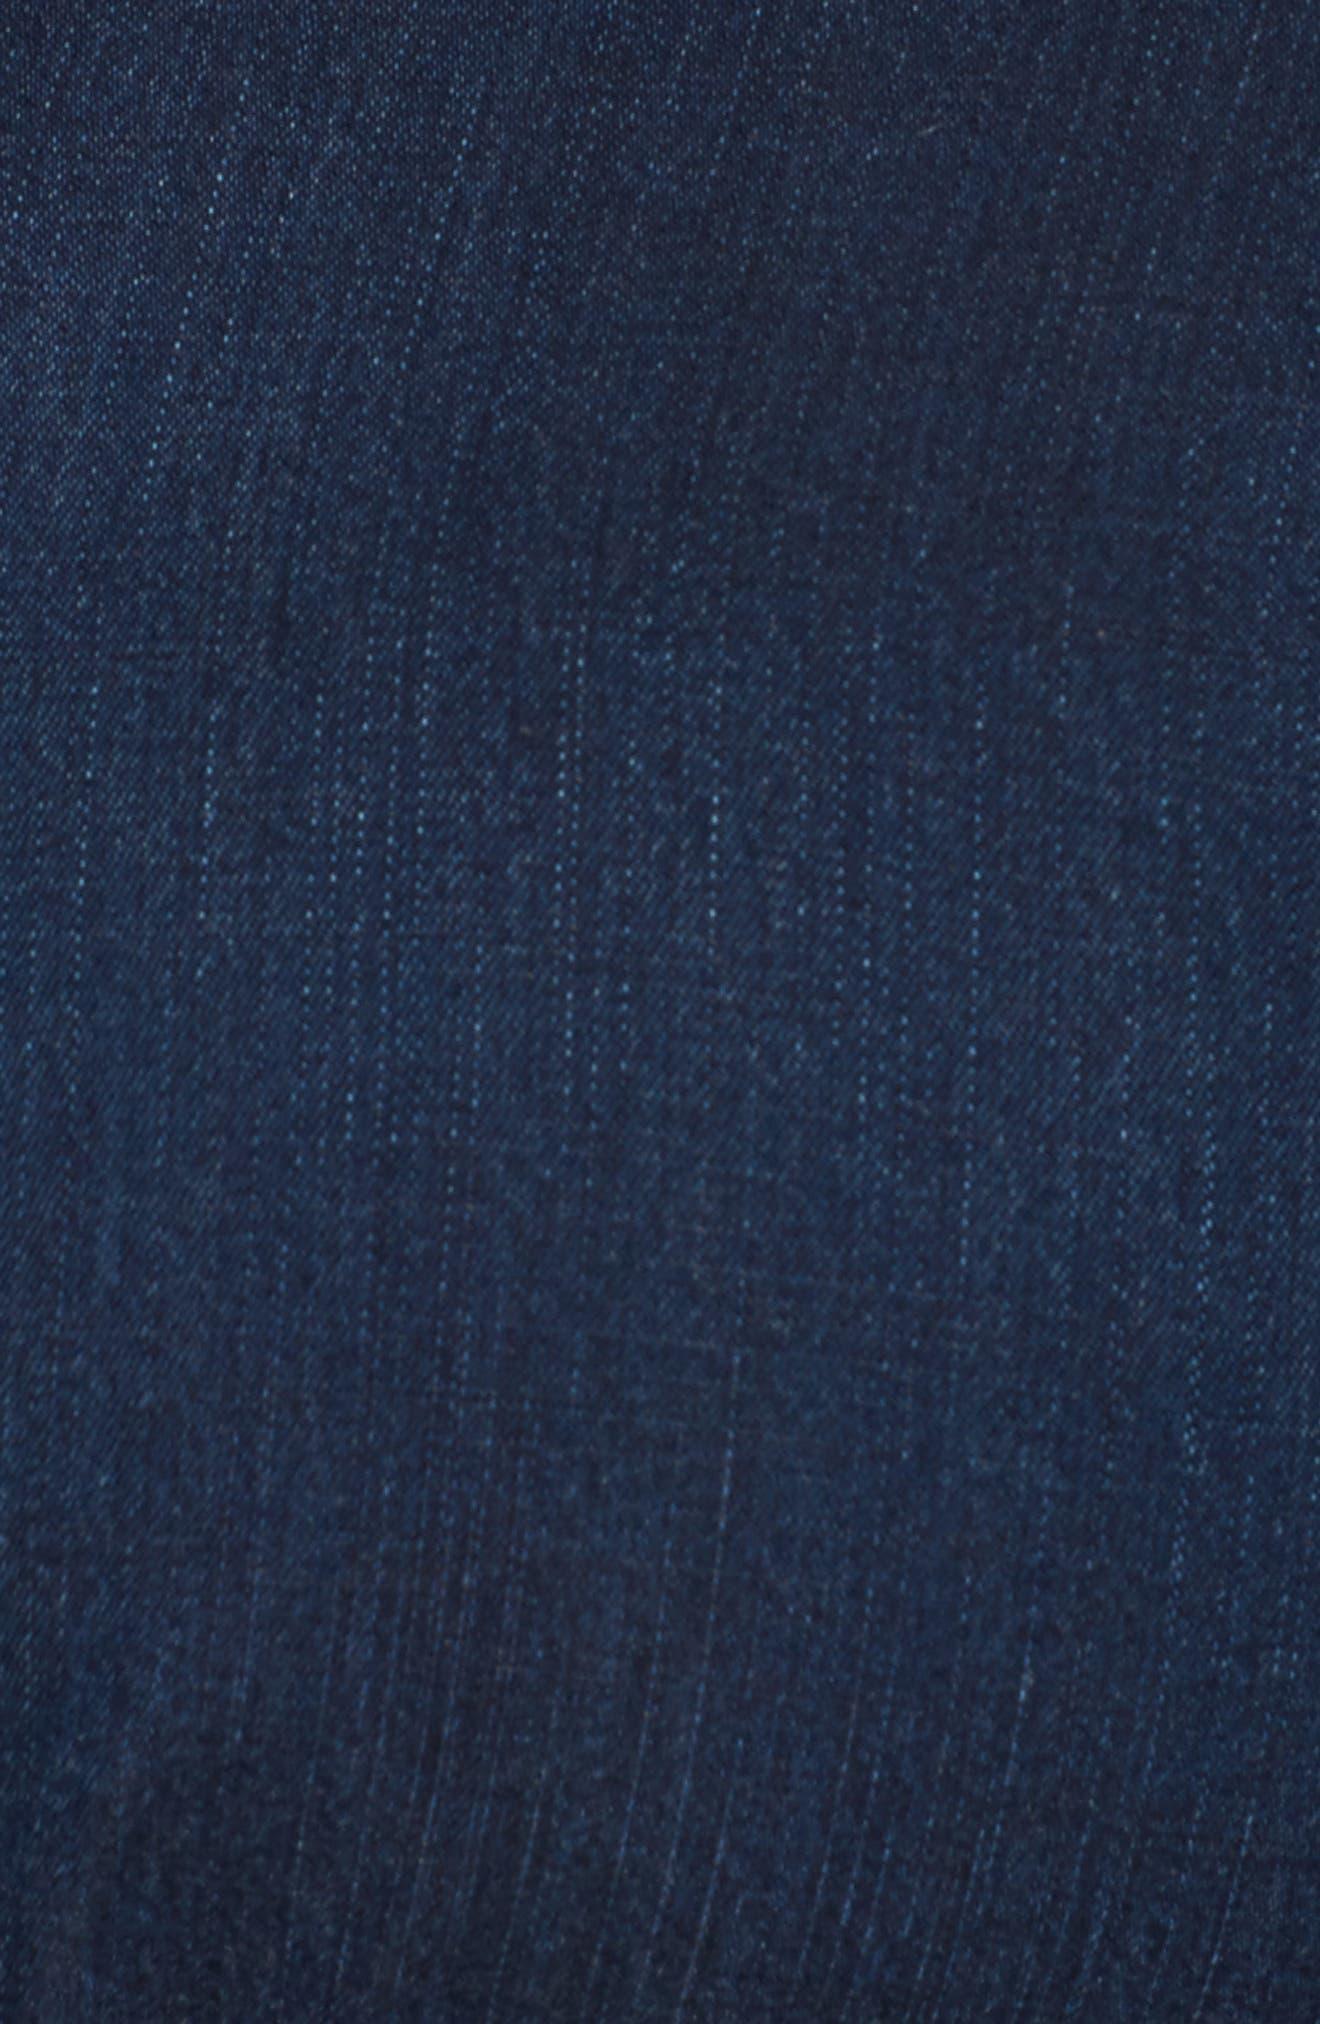 Denim Shirtdress,                             Alternate thumbnail 5, color,